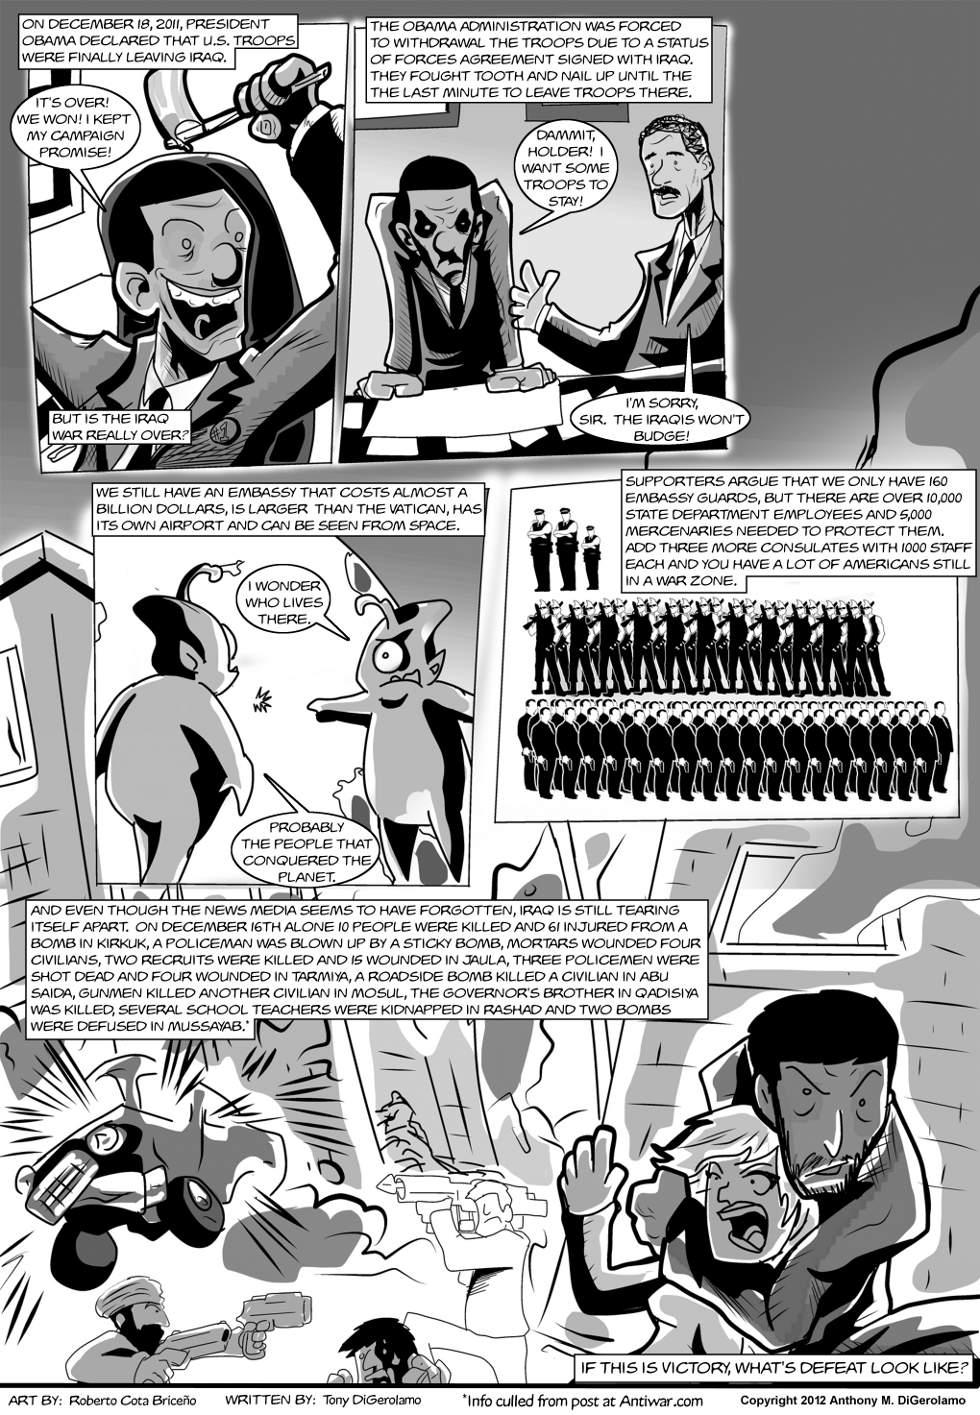 The Antiwar Comic:  Iraq is Still Burning